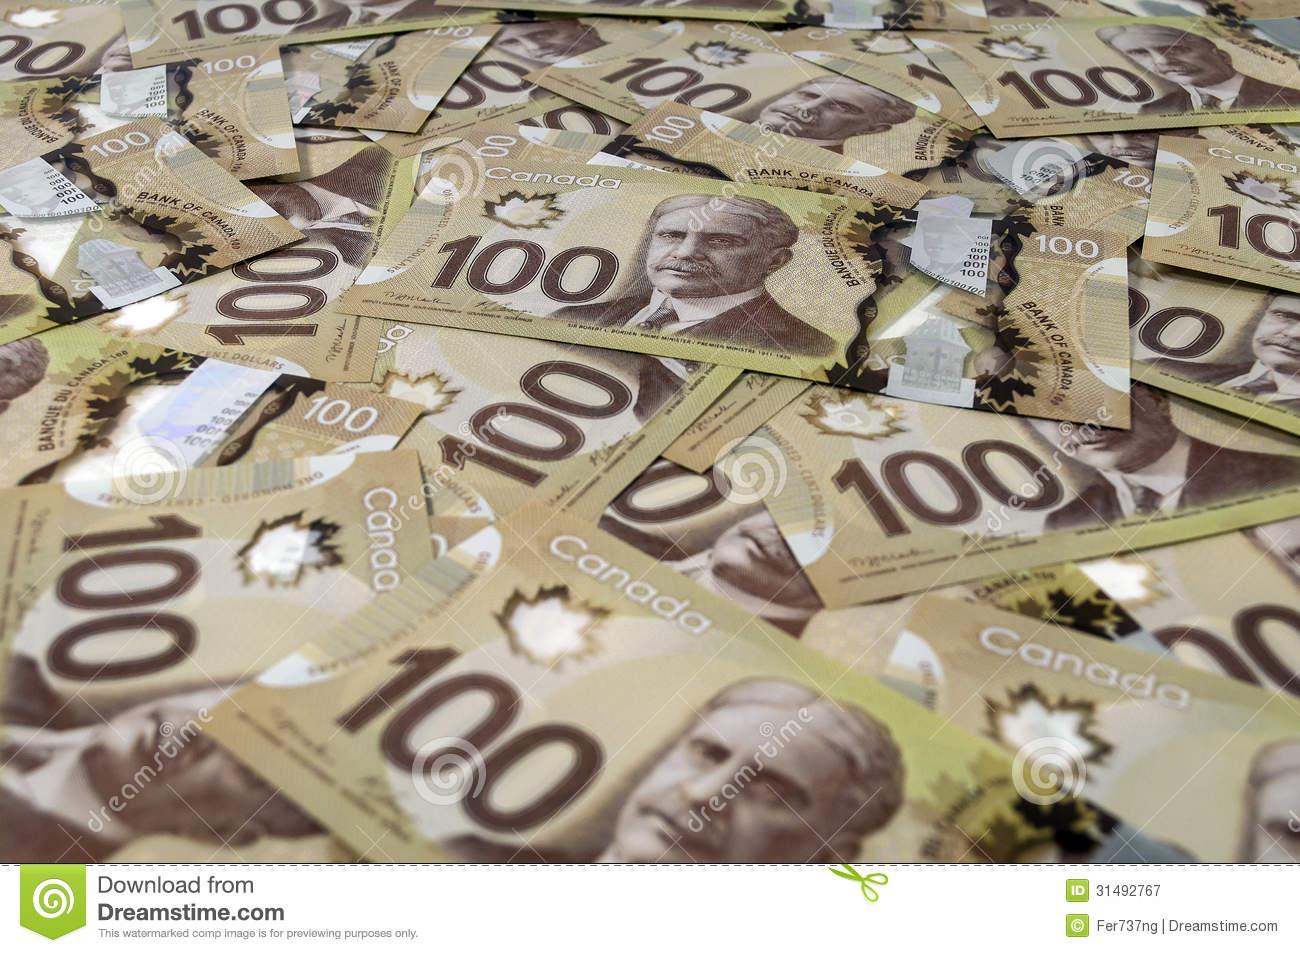 Rencontre banque du canada